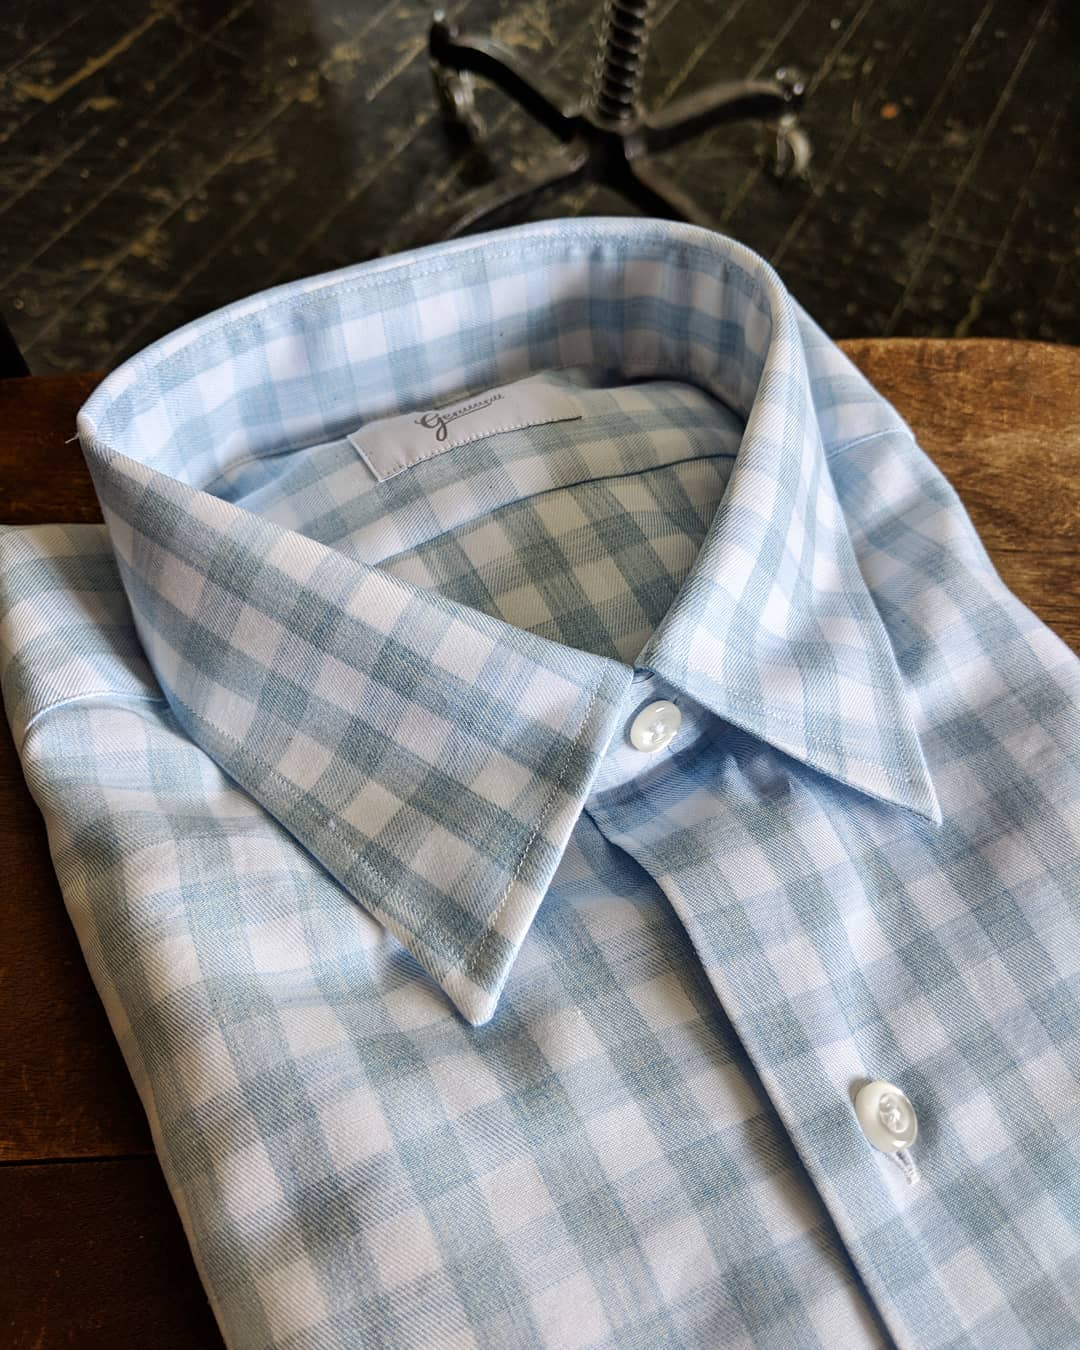 bespoke_shirts_new_york_tailor.jpg